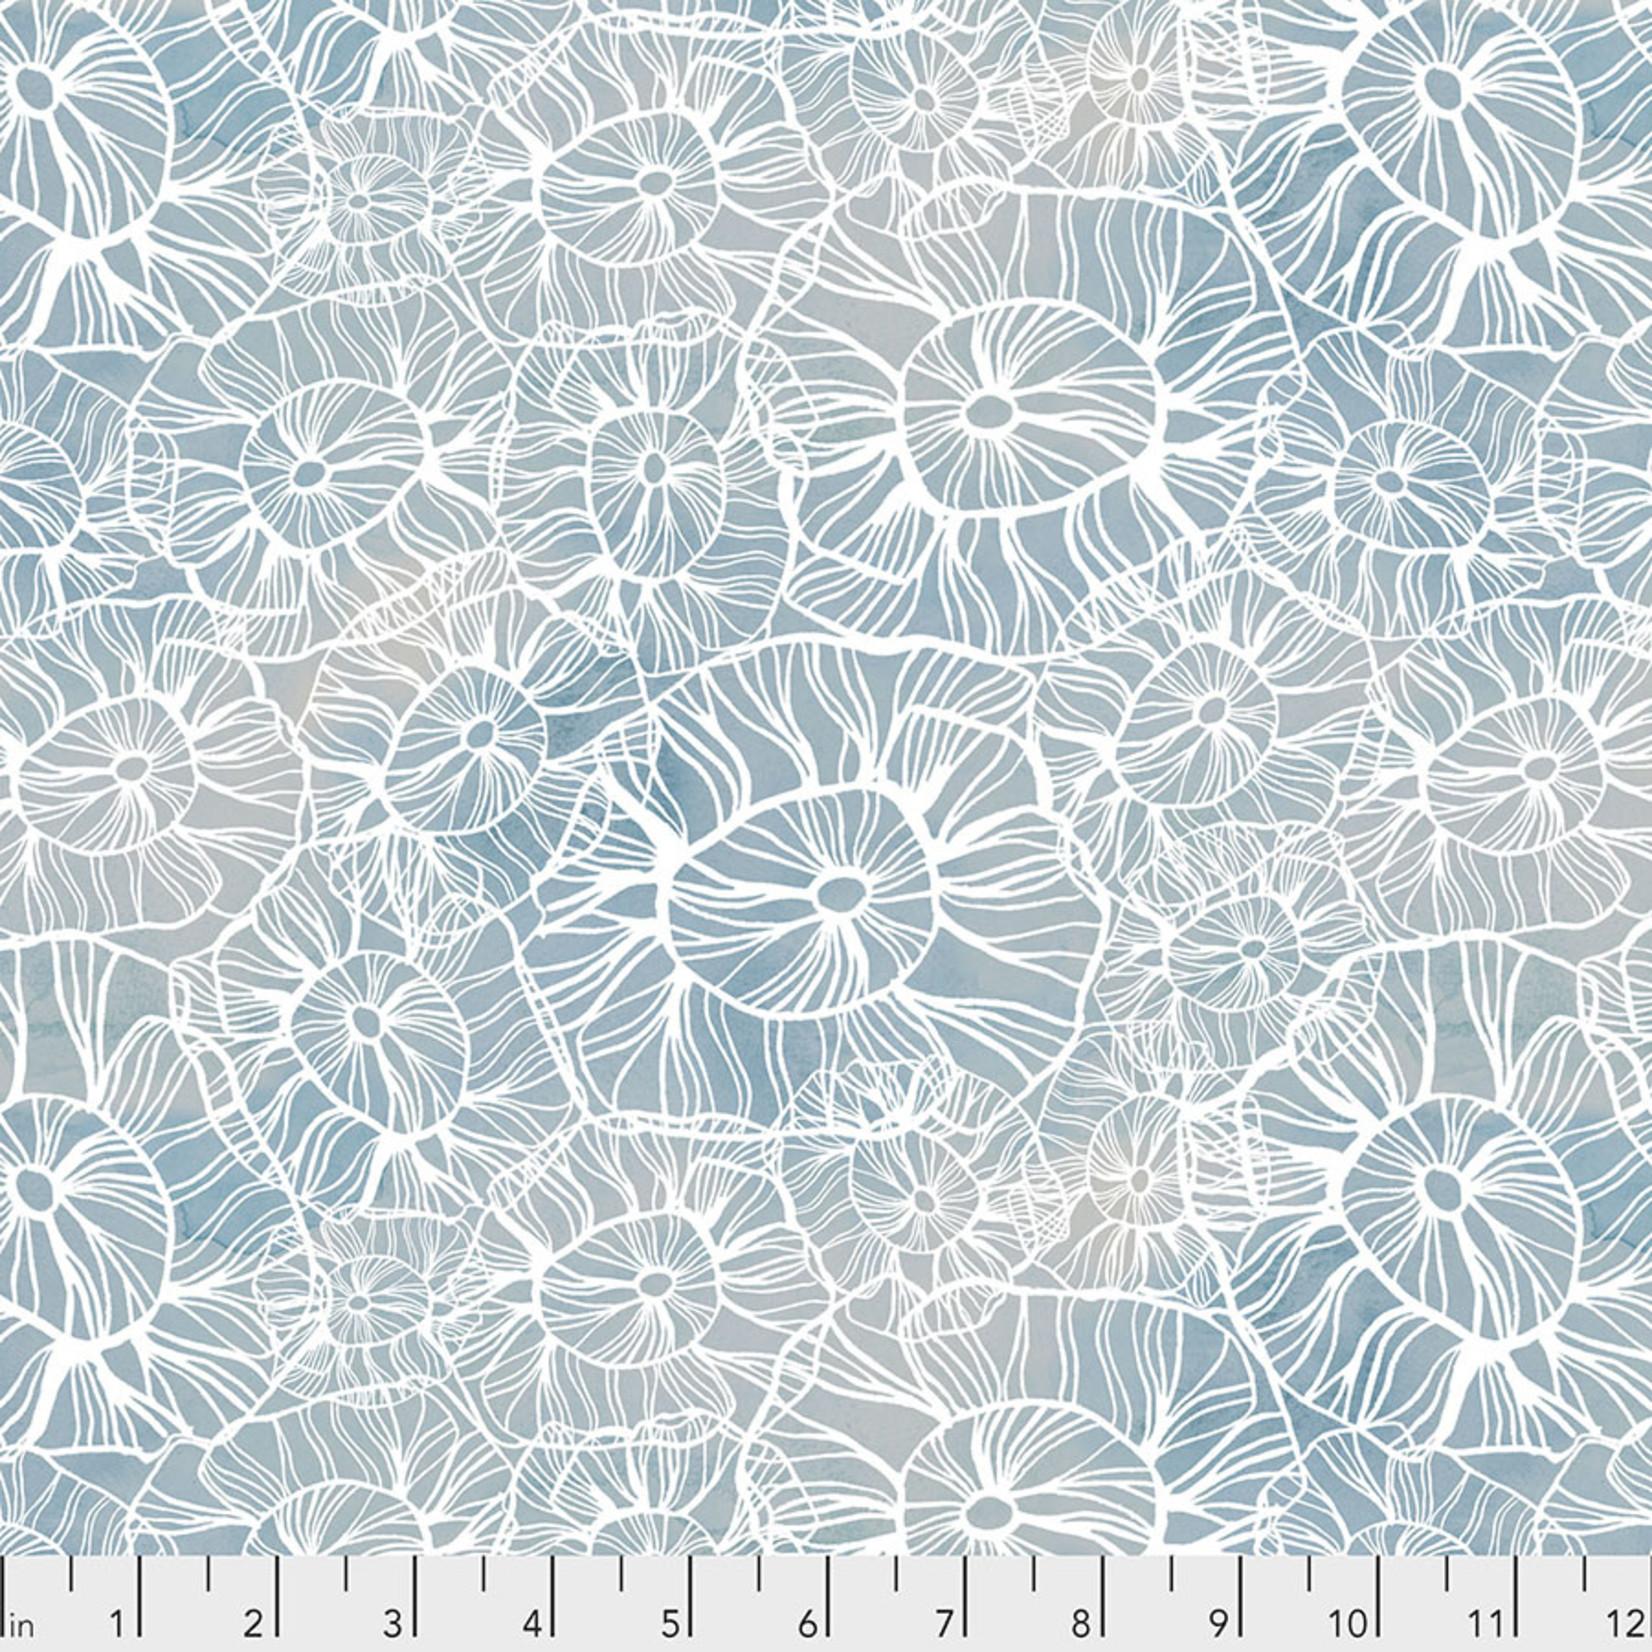 Free Spirit Time and Tide, Sea Flower - Ocean- $0.16 per cm or $16/m